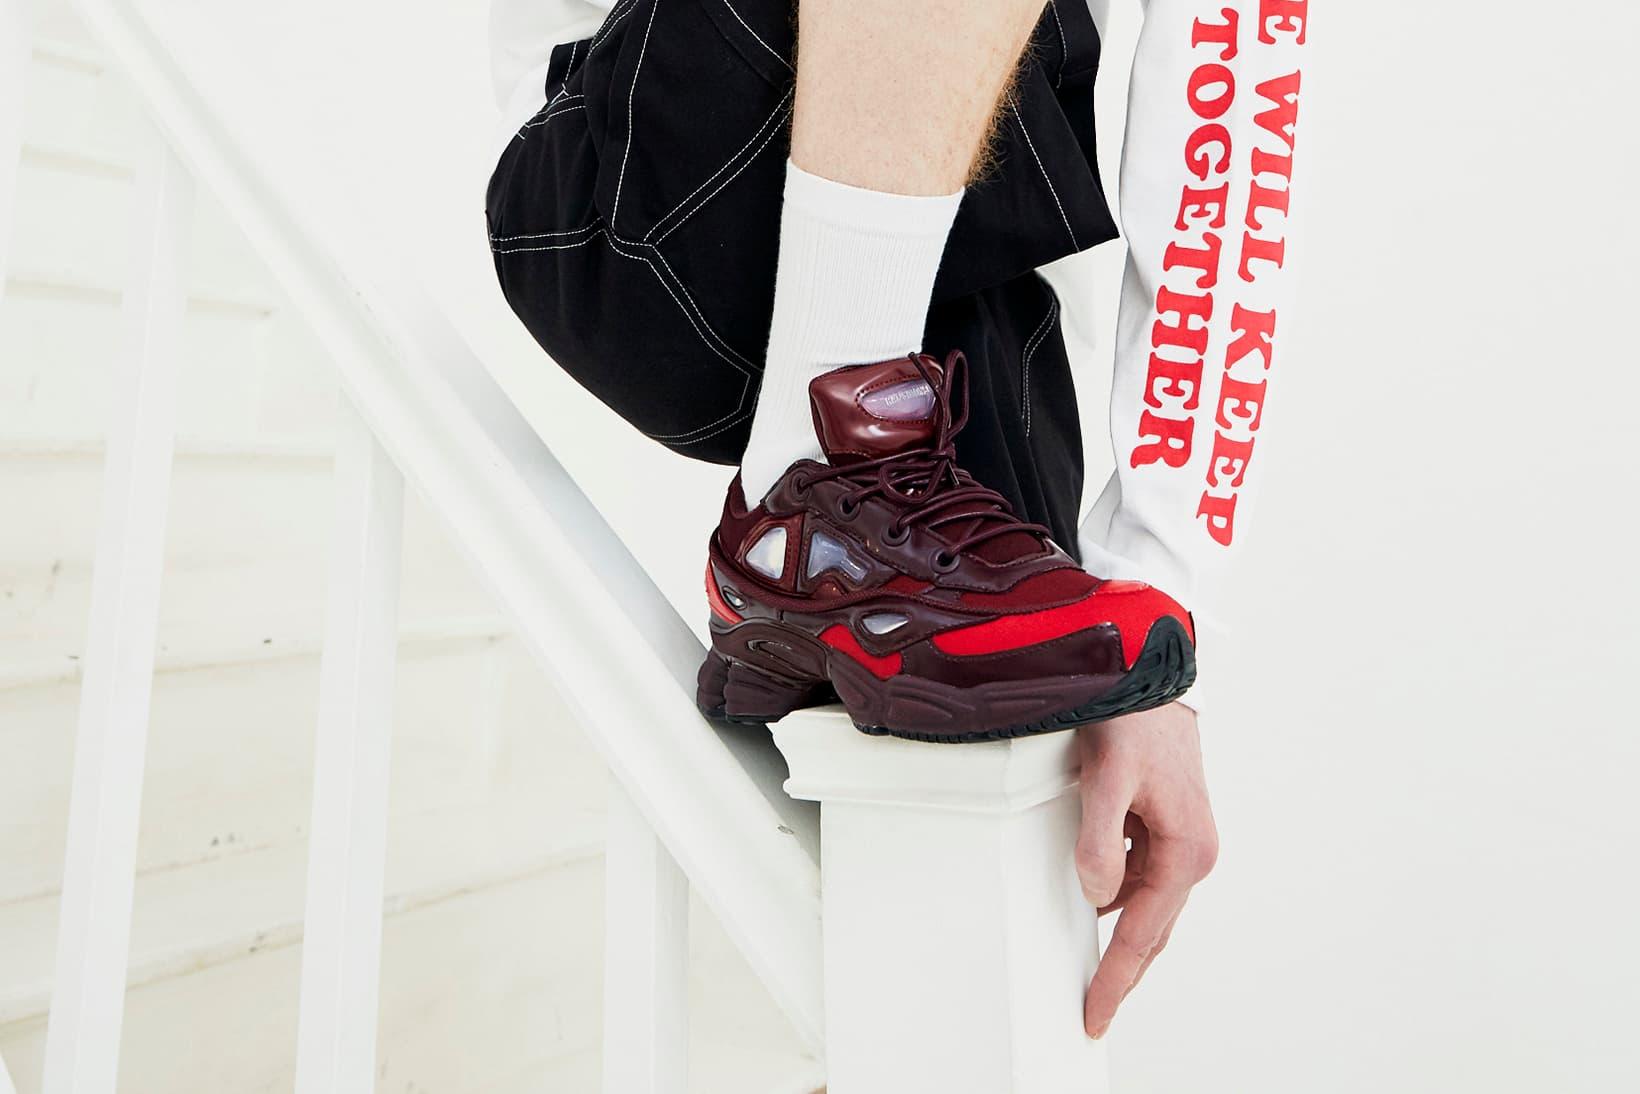 New Raf Simons x adidas & Nine More Essential European Drops